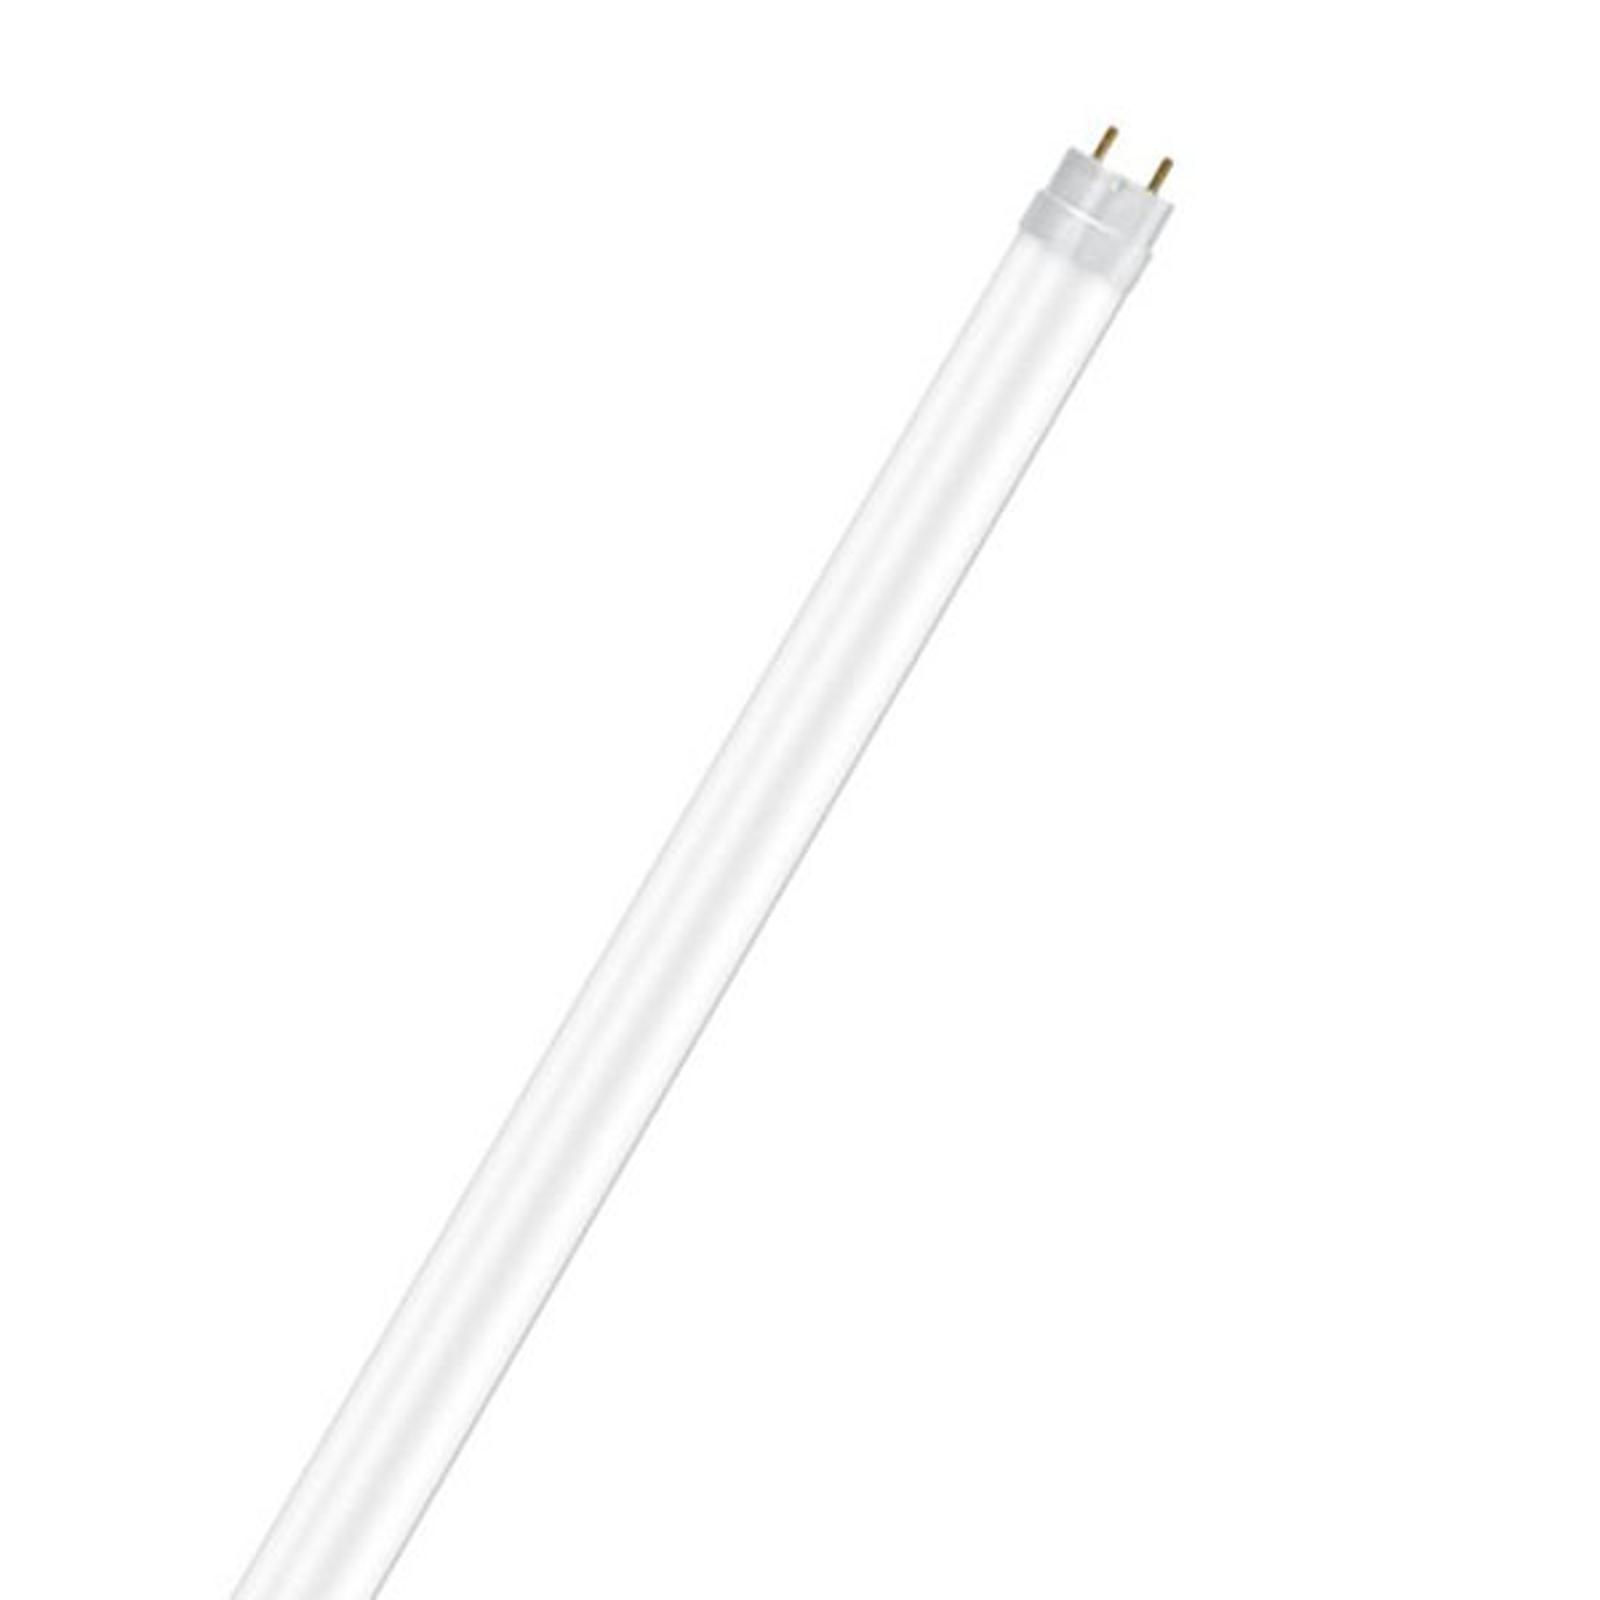 OSRAM LED-Röhre G13 120cm SubstiTUBE 16,4W 3.000K kaufen